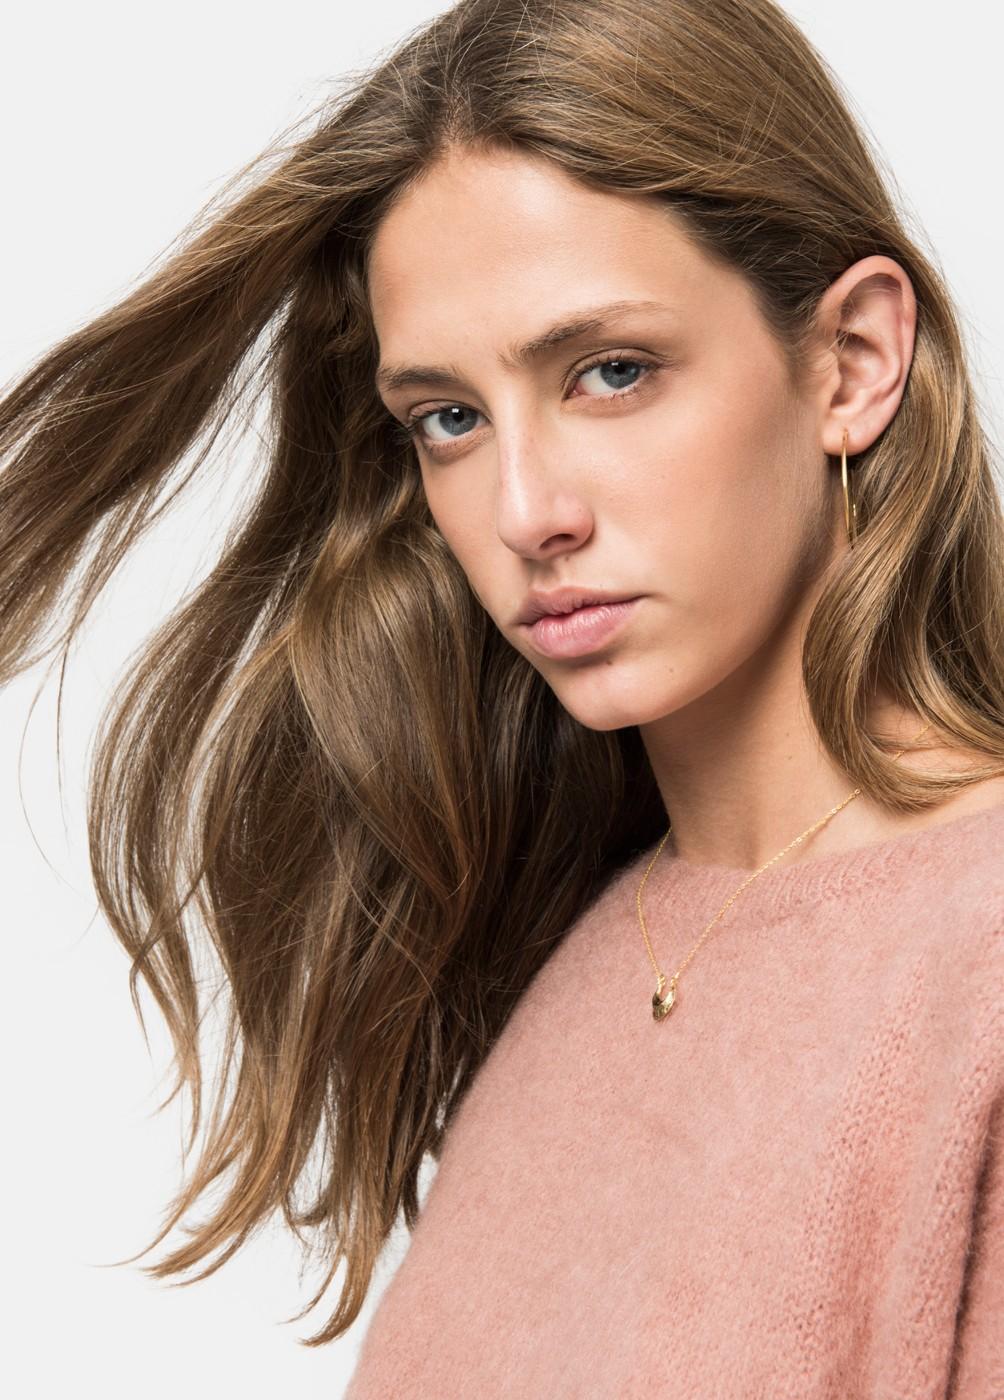 Middle aro earrings